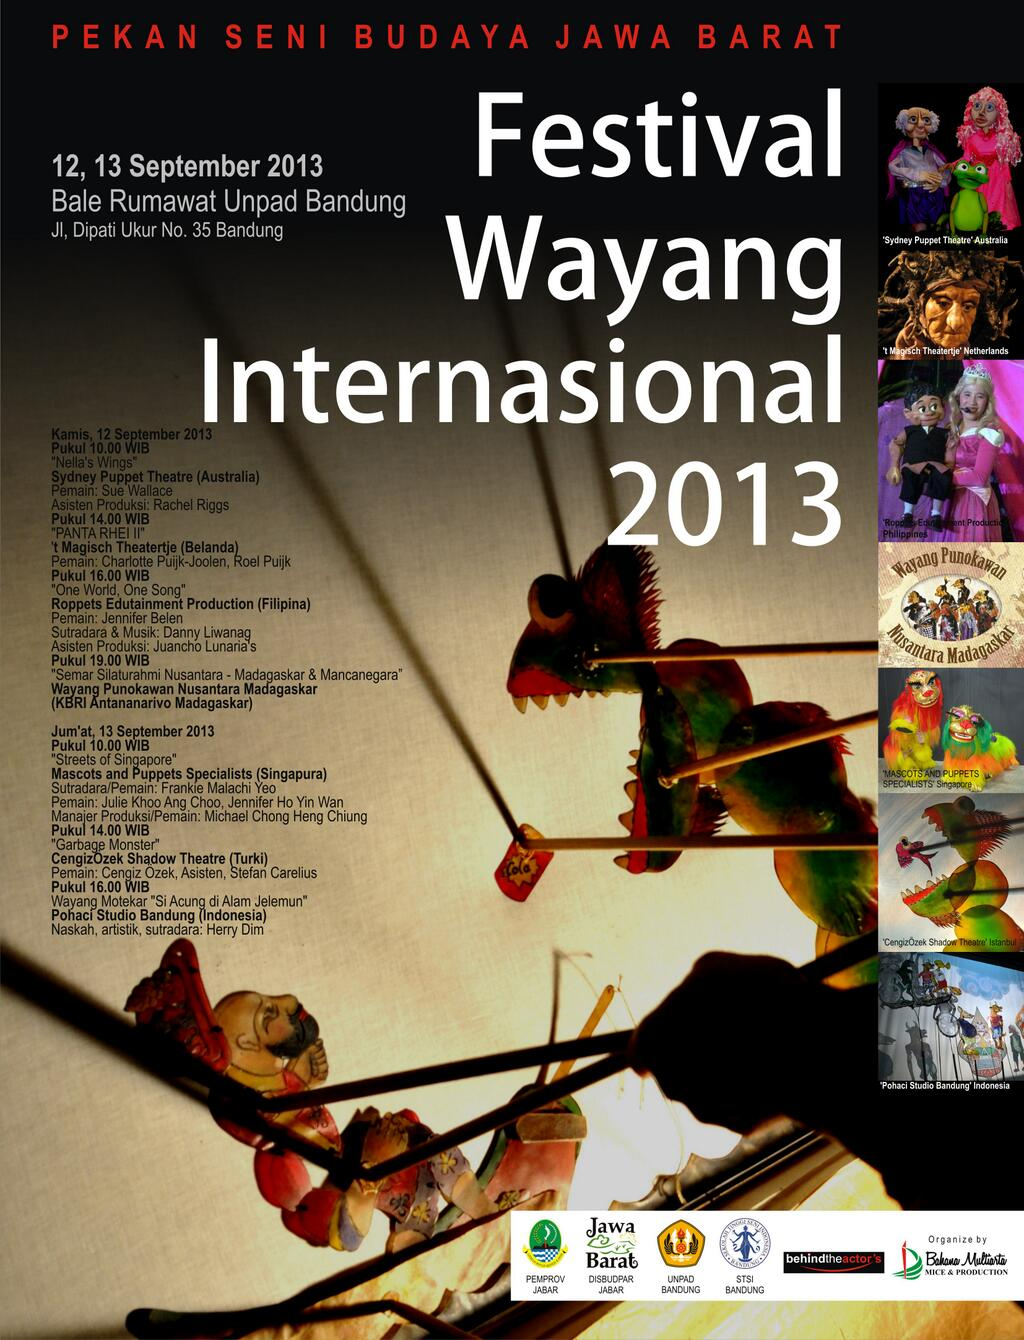 festival wayang internasional